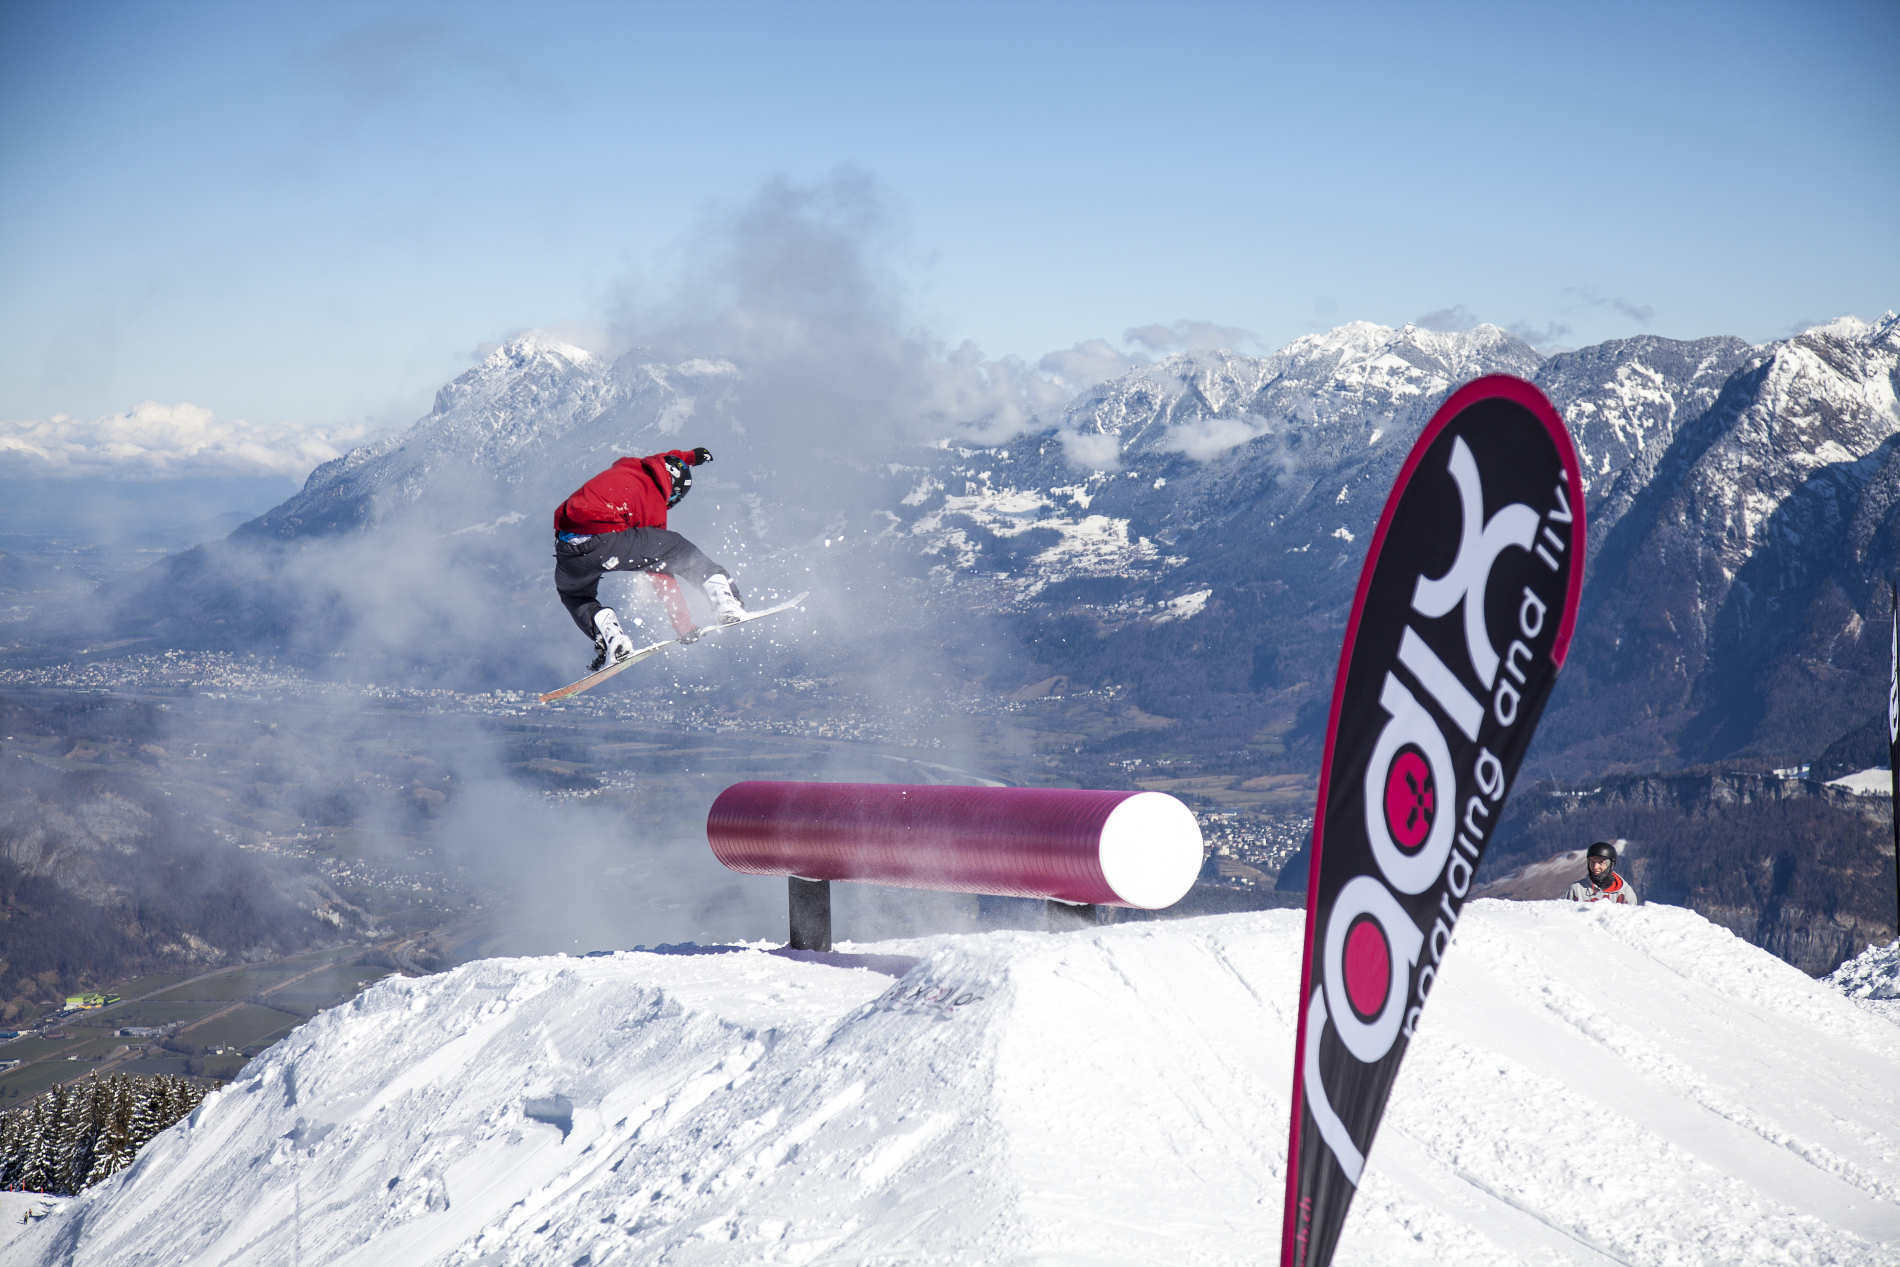 Snowboarder's High at Riderpark Pizol – Season Teaser 2017/18